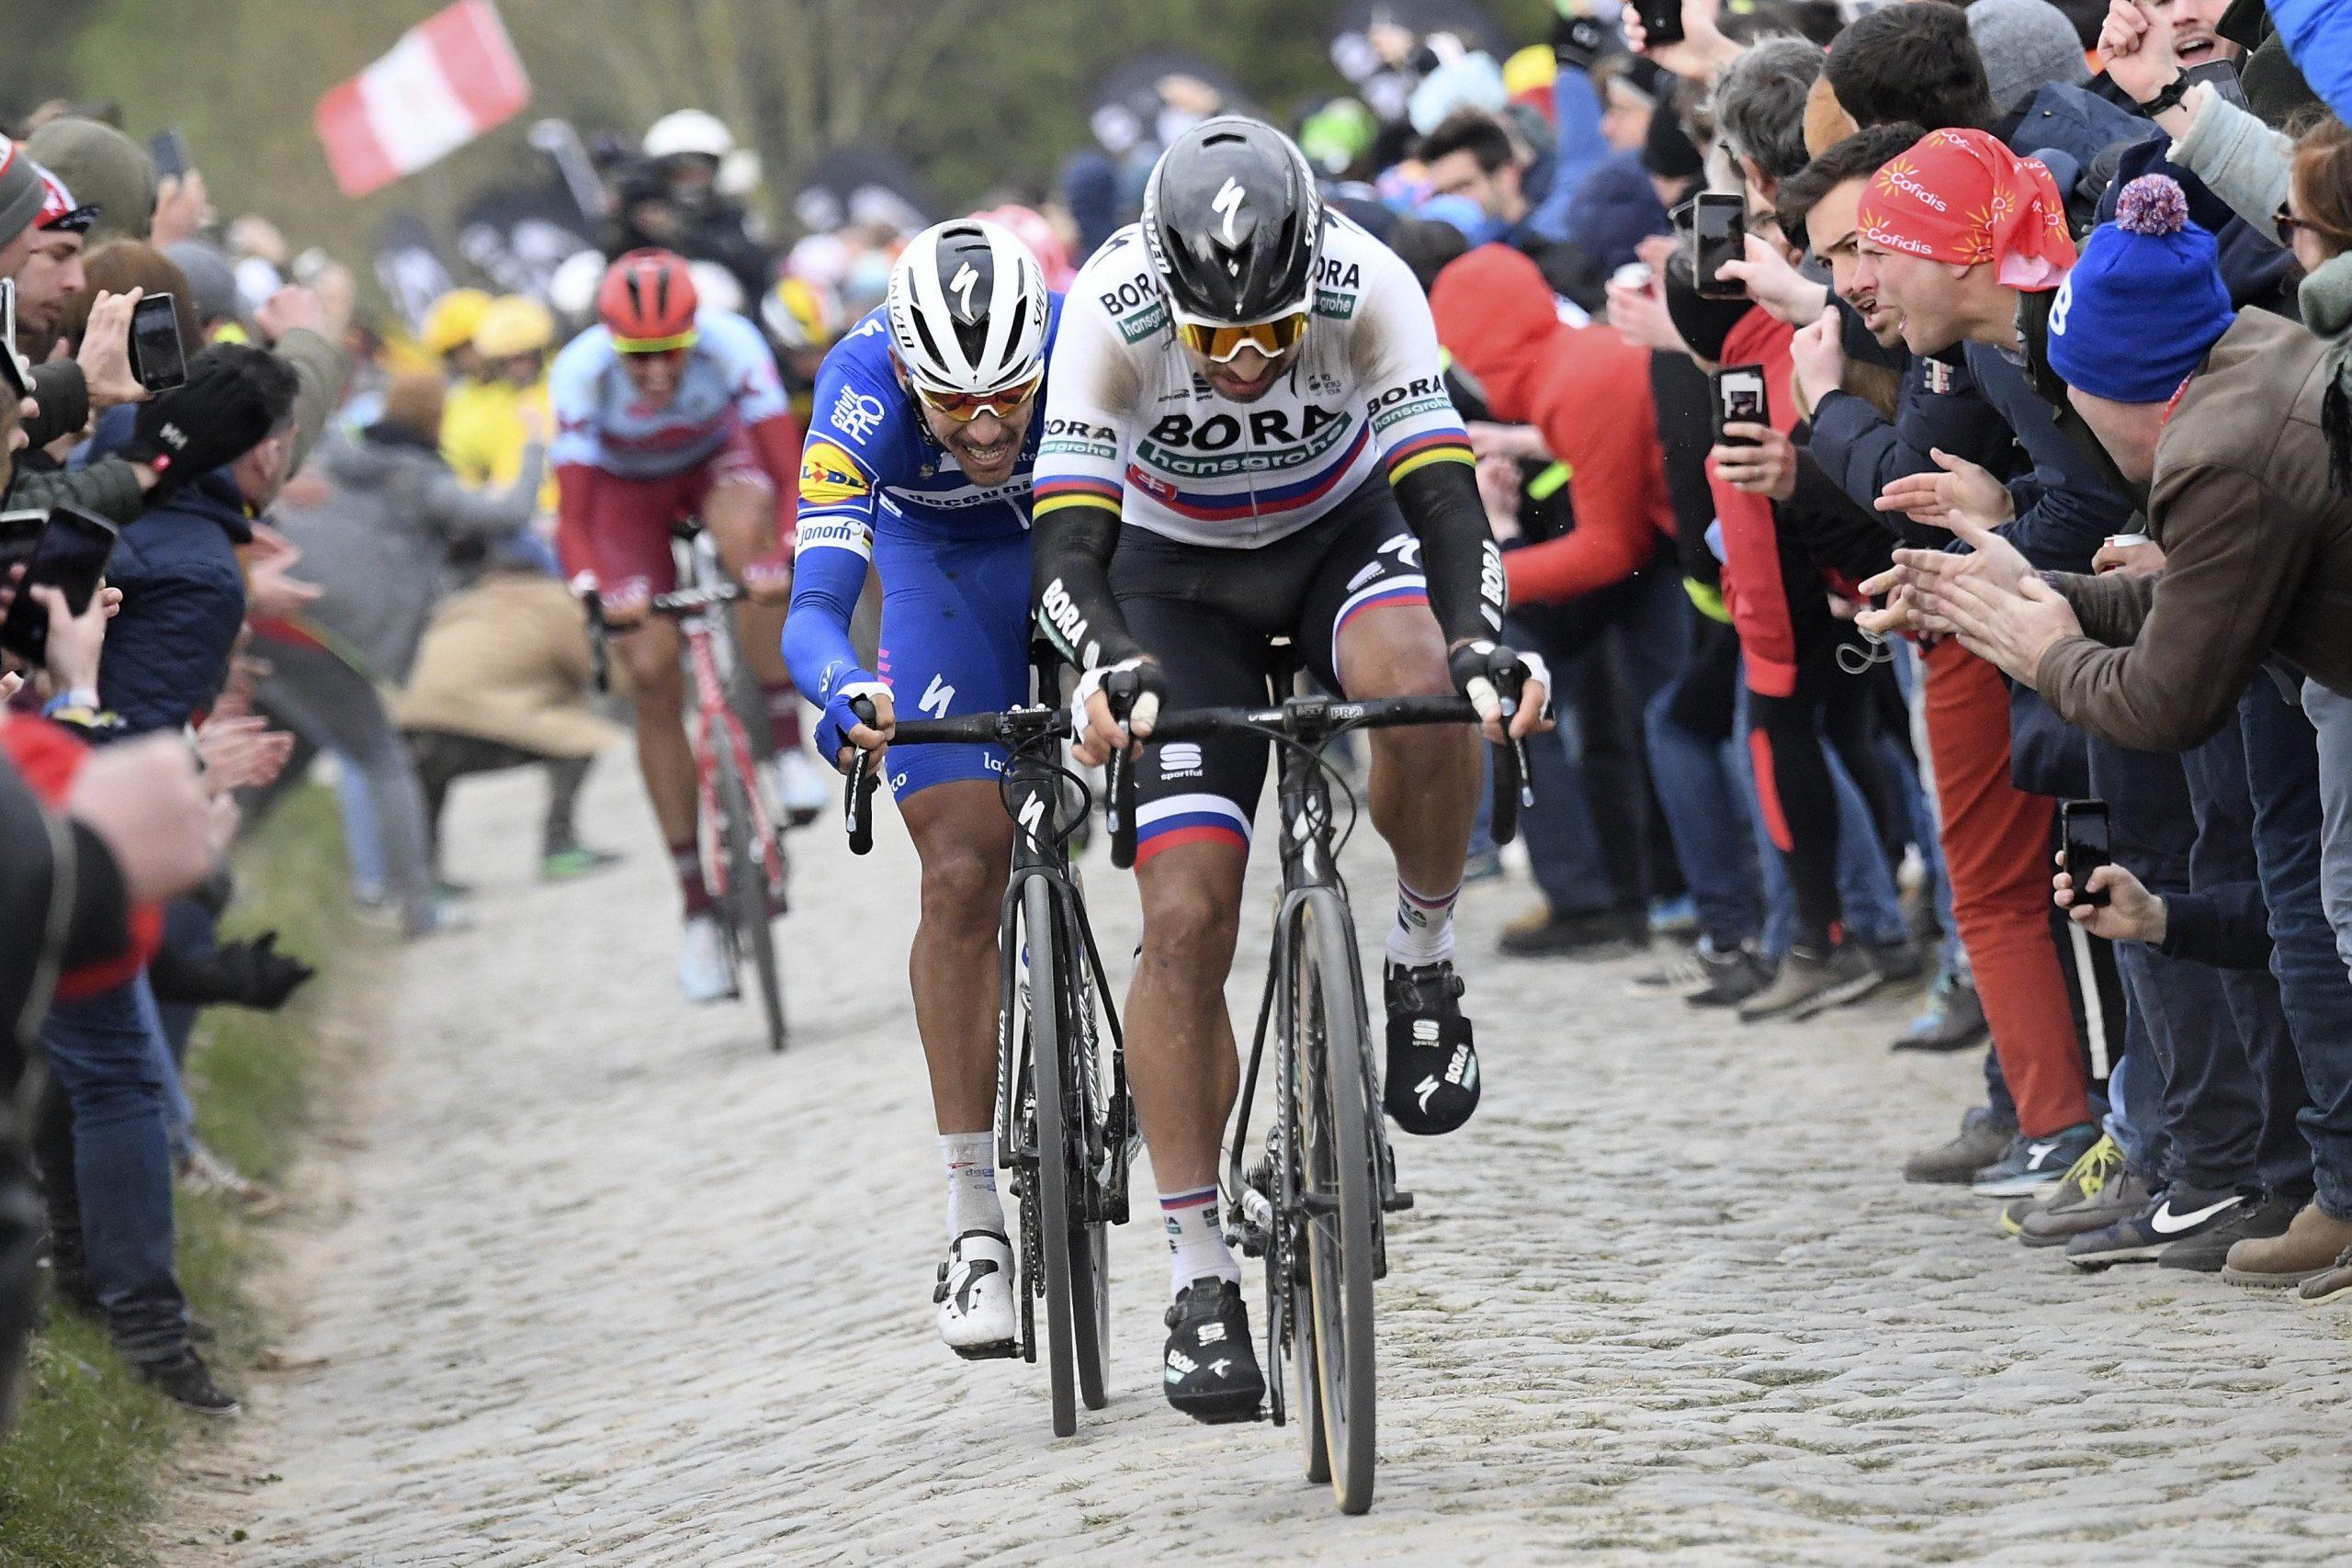 Paris-Roubaix has been cancelled | CyclingTips